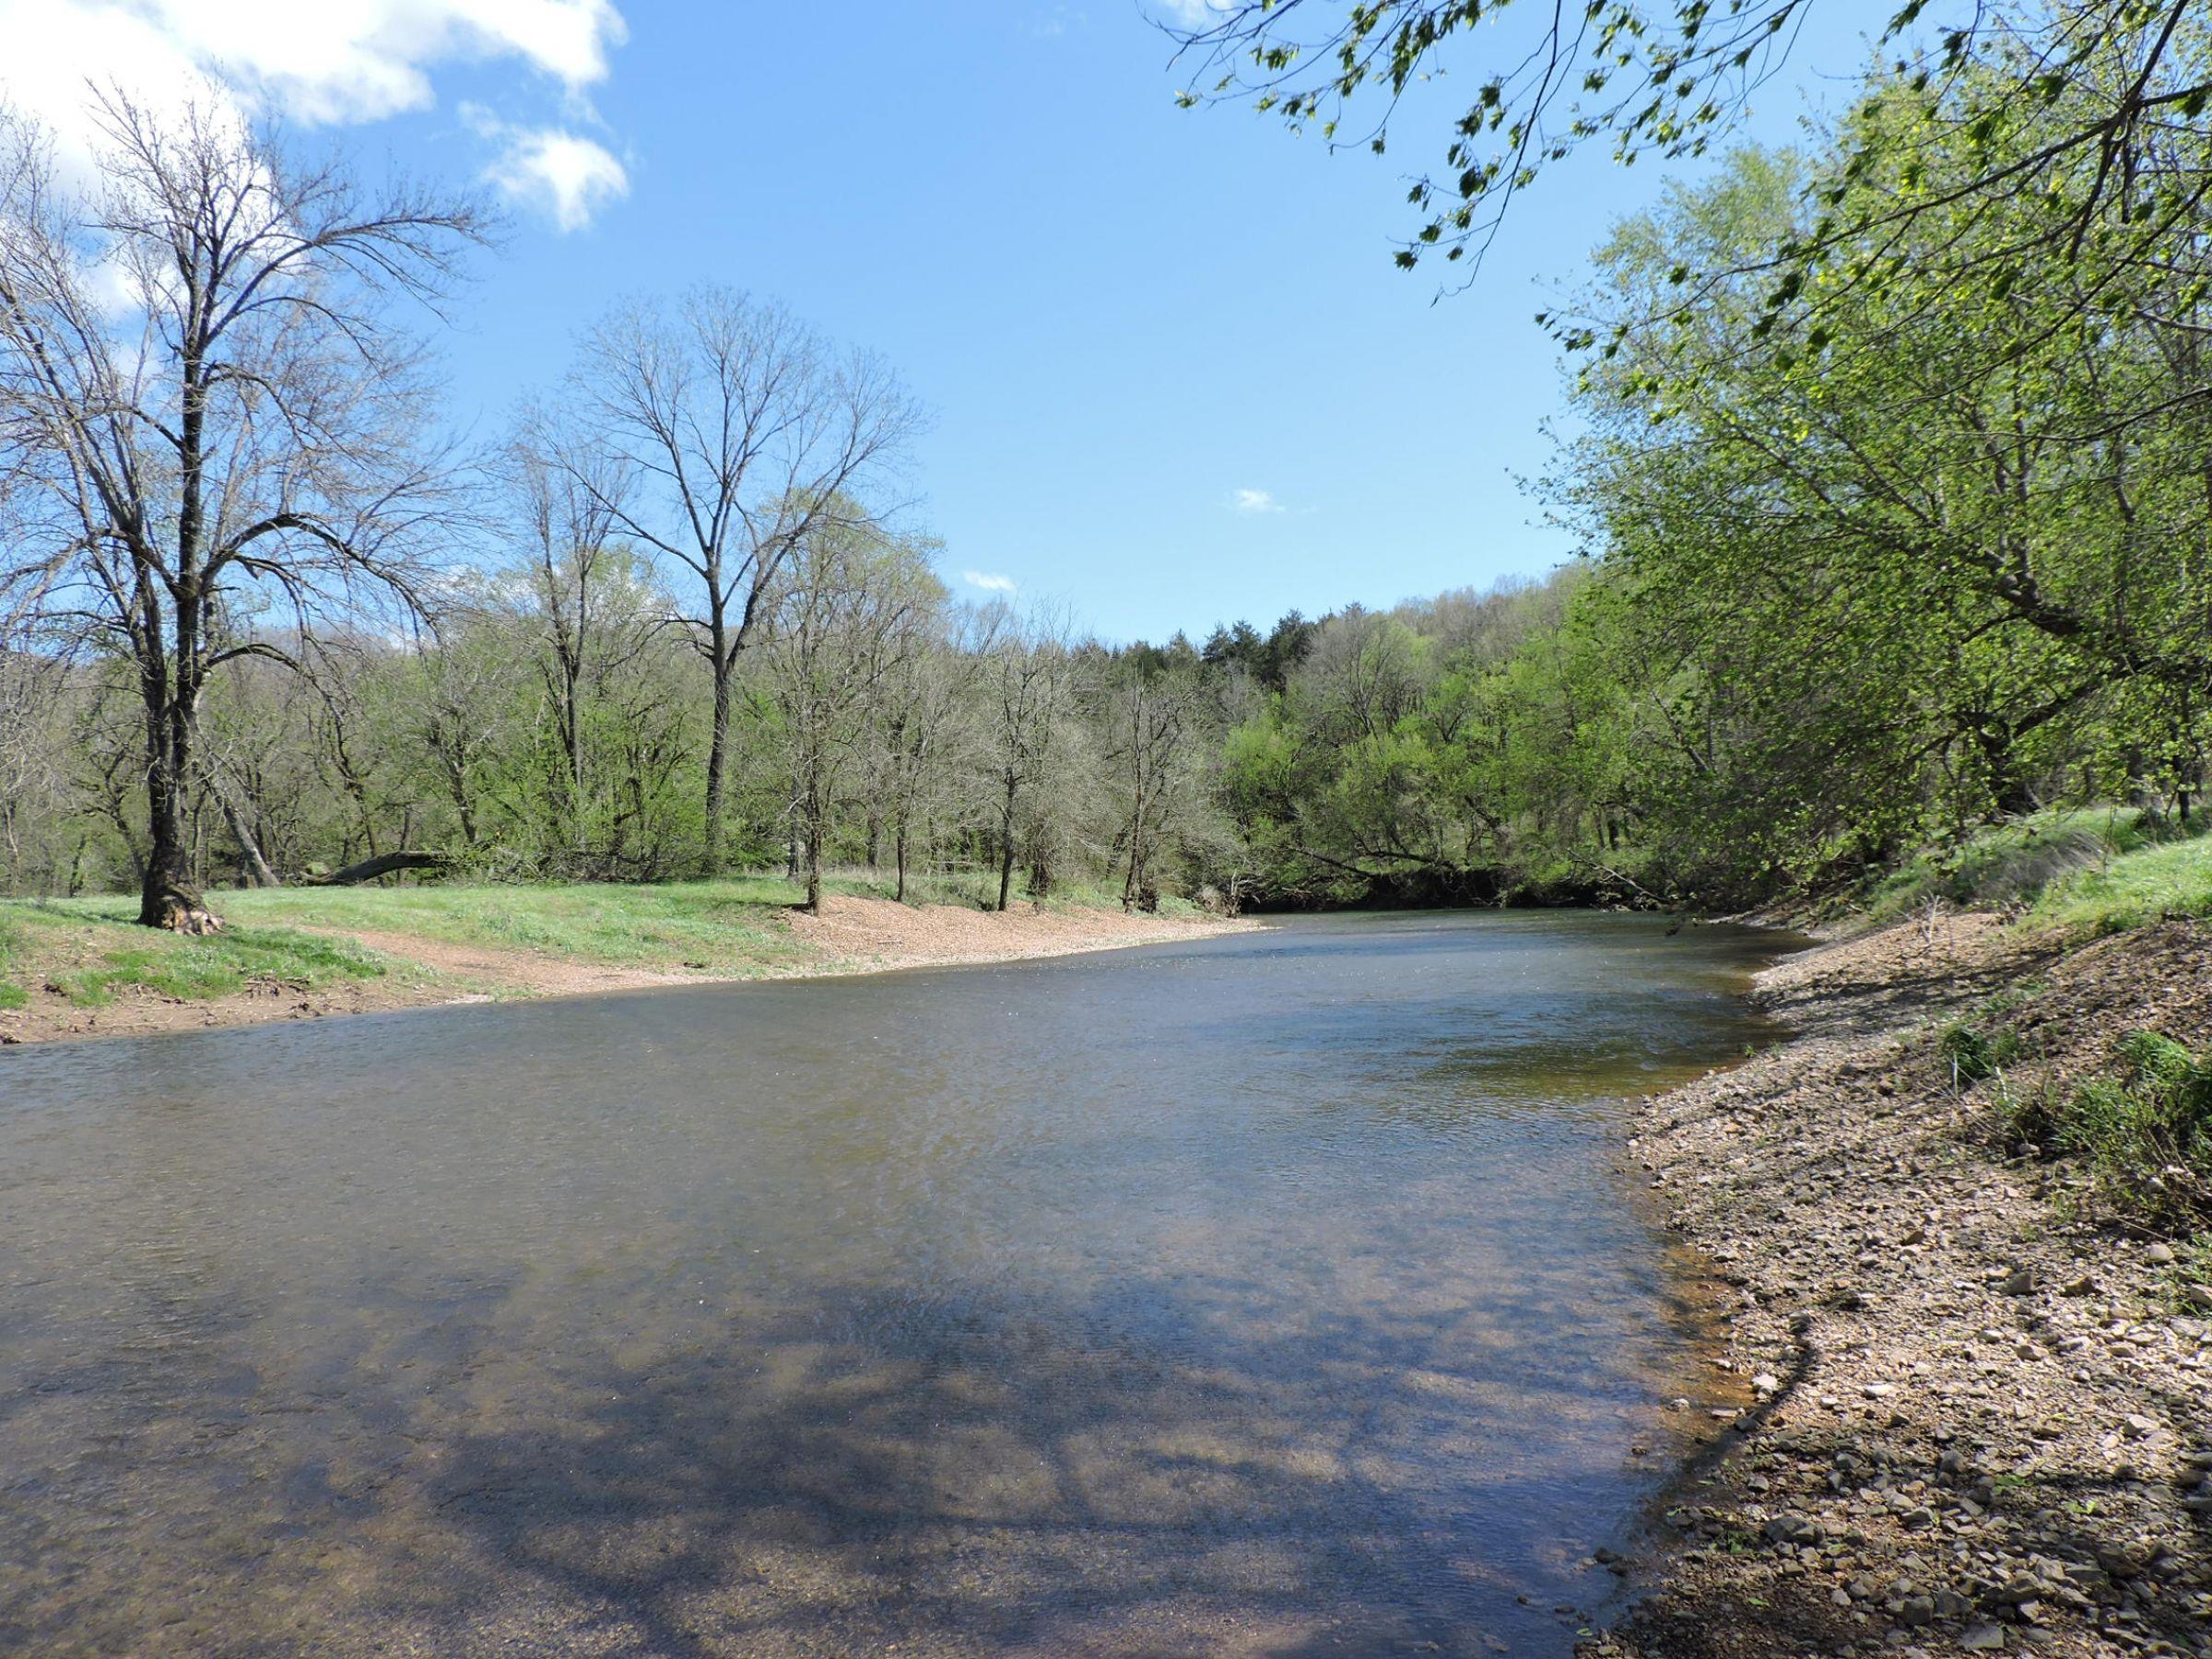 land-sharp-county-arkansas-695-acres-listing-number-15405-16-2021-04-13-213616.JPG